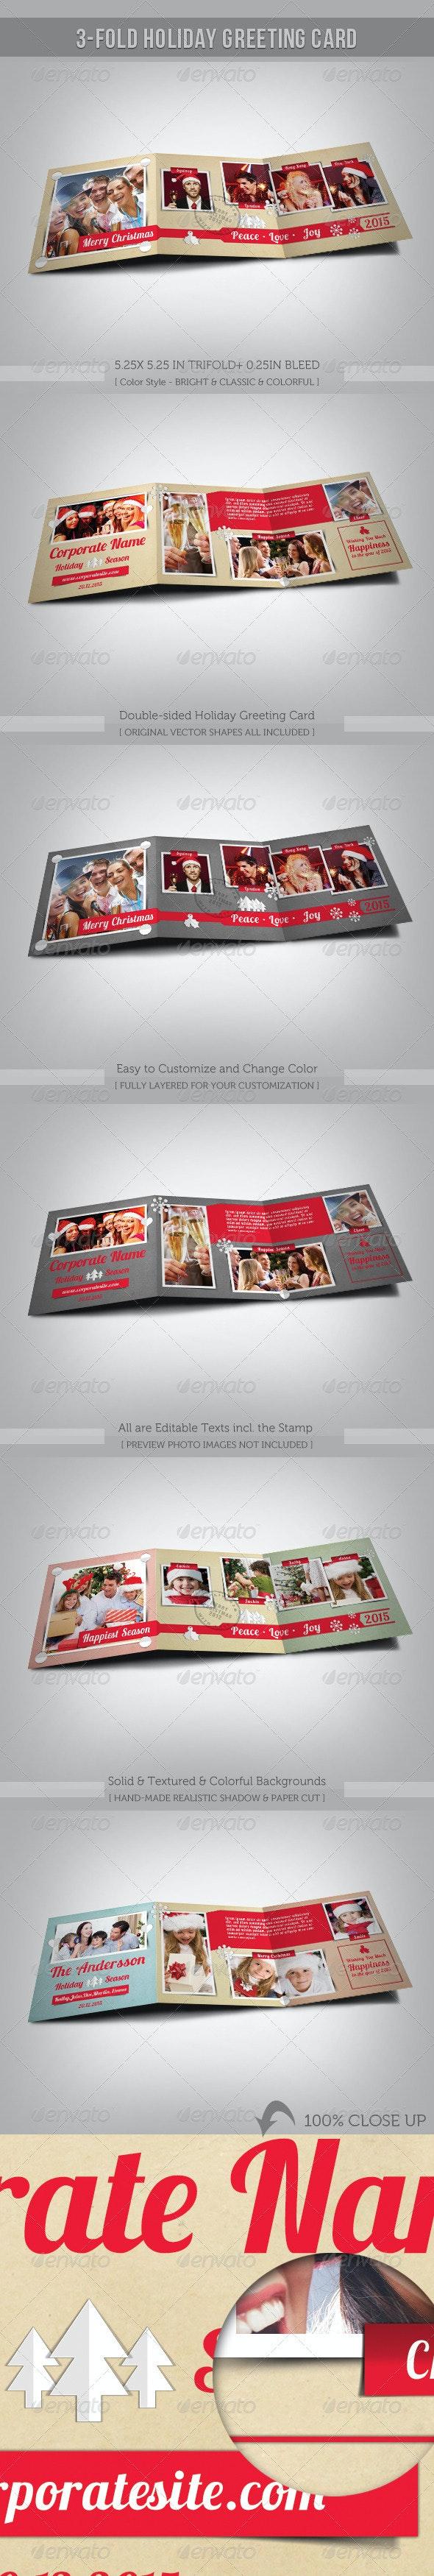 3-Fold Holiday Greeting Card - Holiday Greeting Cards